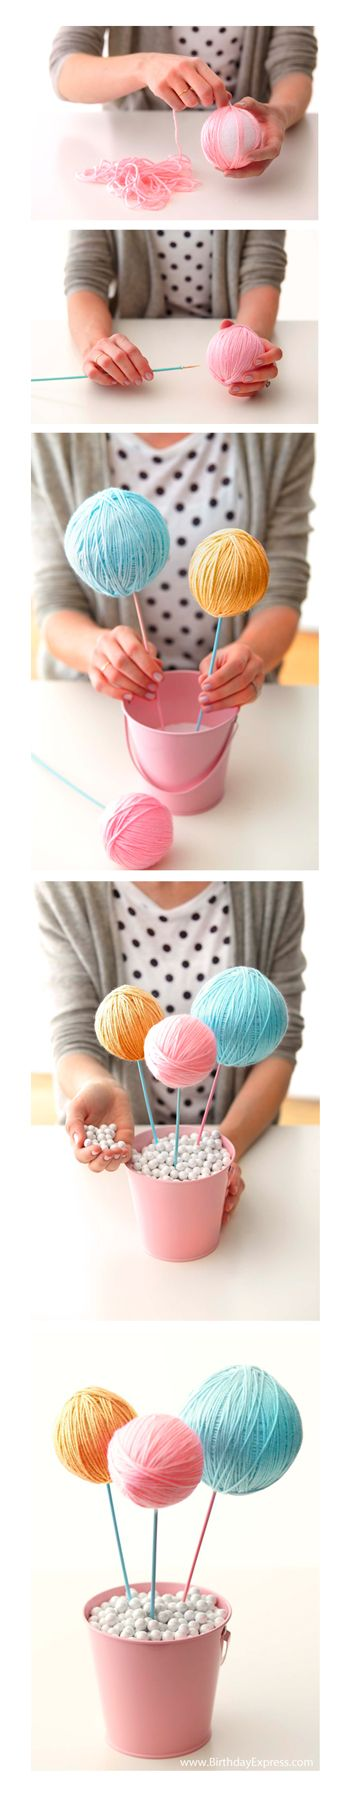 Lalaloopsy birthday party. Lalaloopsy Centerpiece, yarn balls.